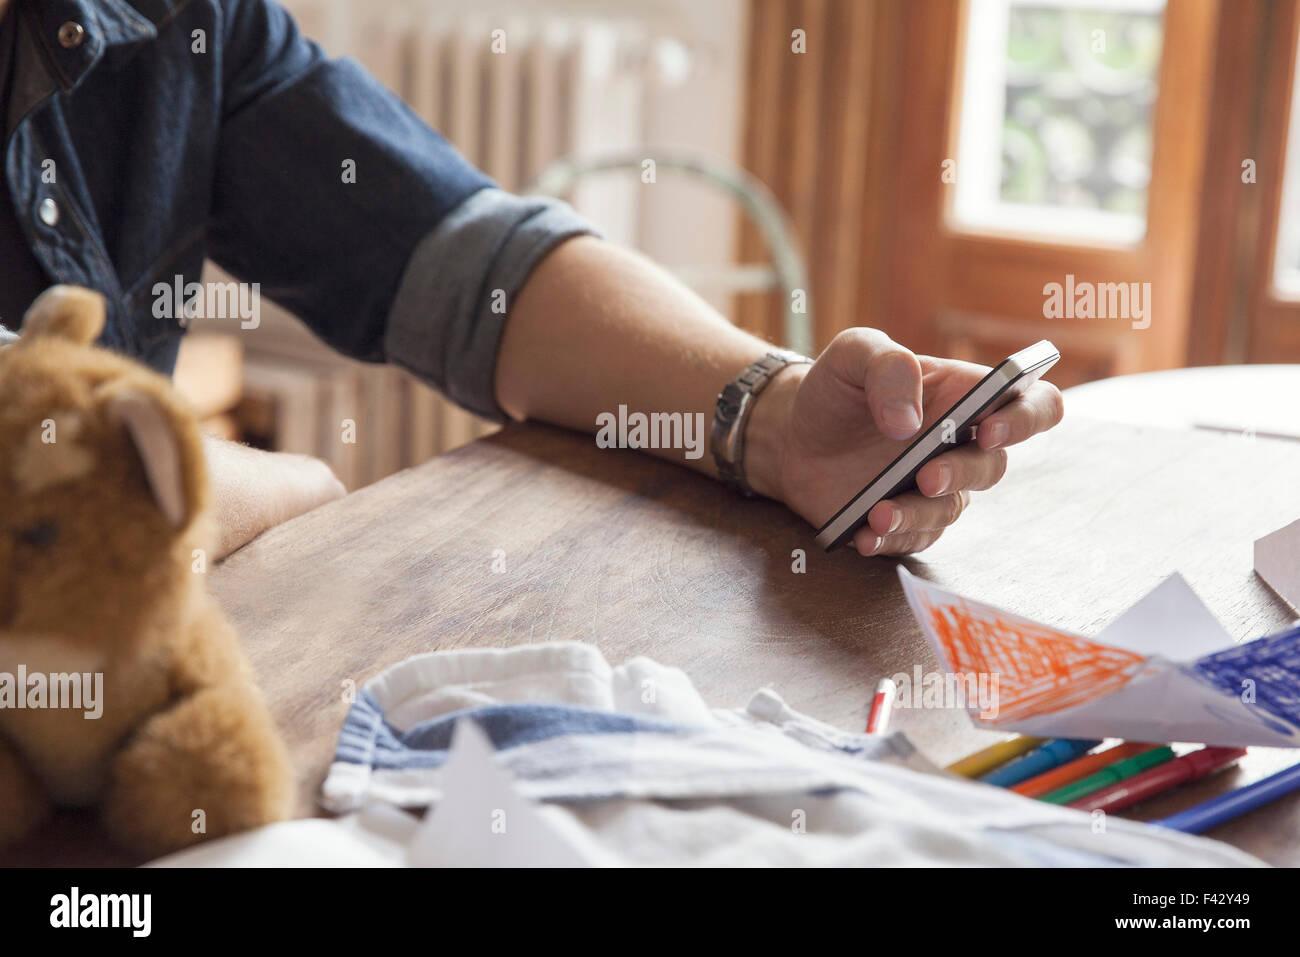 Using smartphone - Stock Image